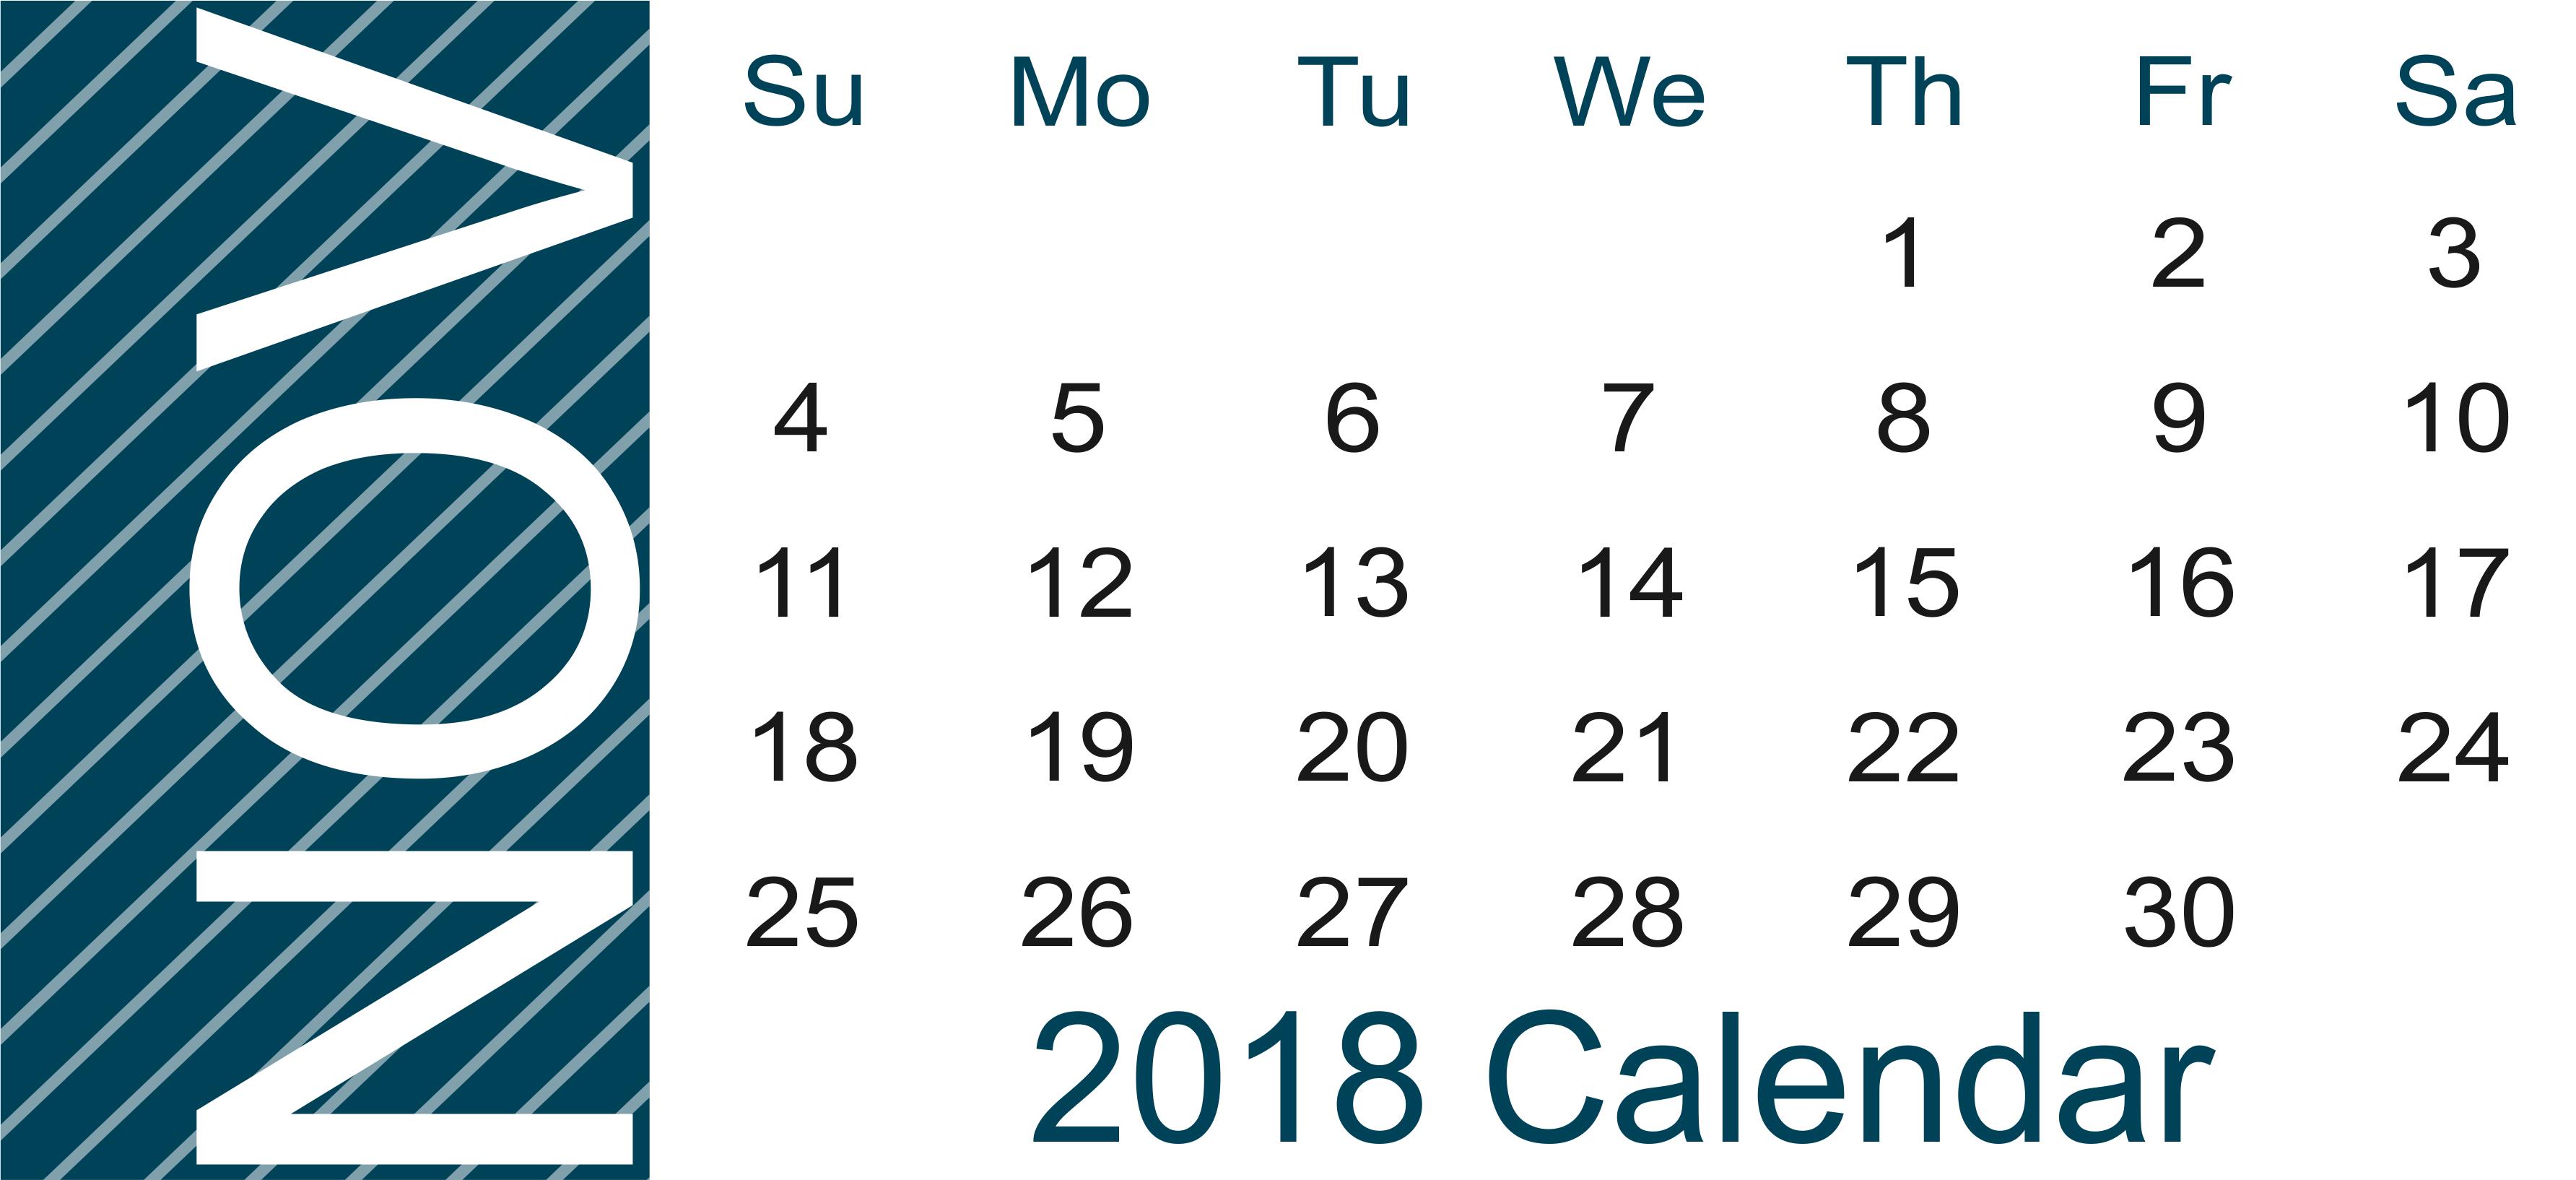 November 2018 Calendar Template Landscape